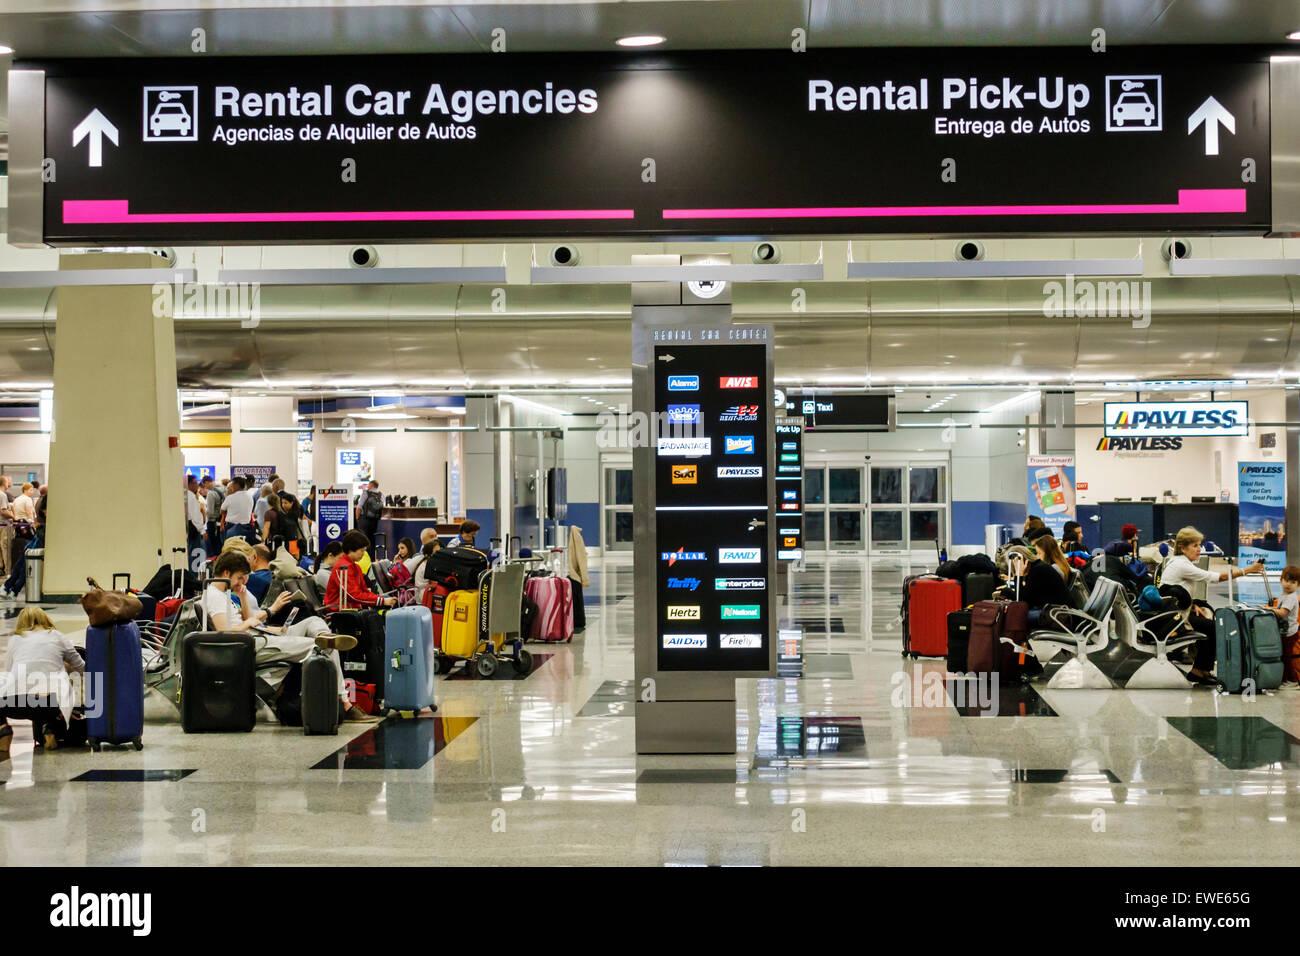 Miami Florida International Airport MIA terminal concourse gate area rental car pick-up sign Spanish English RCC Stock Photo